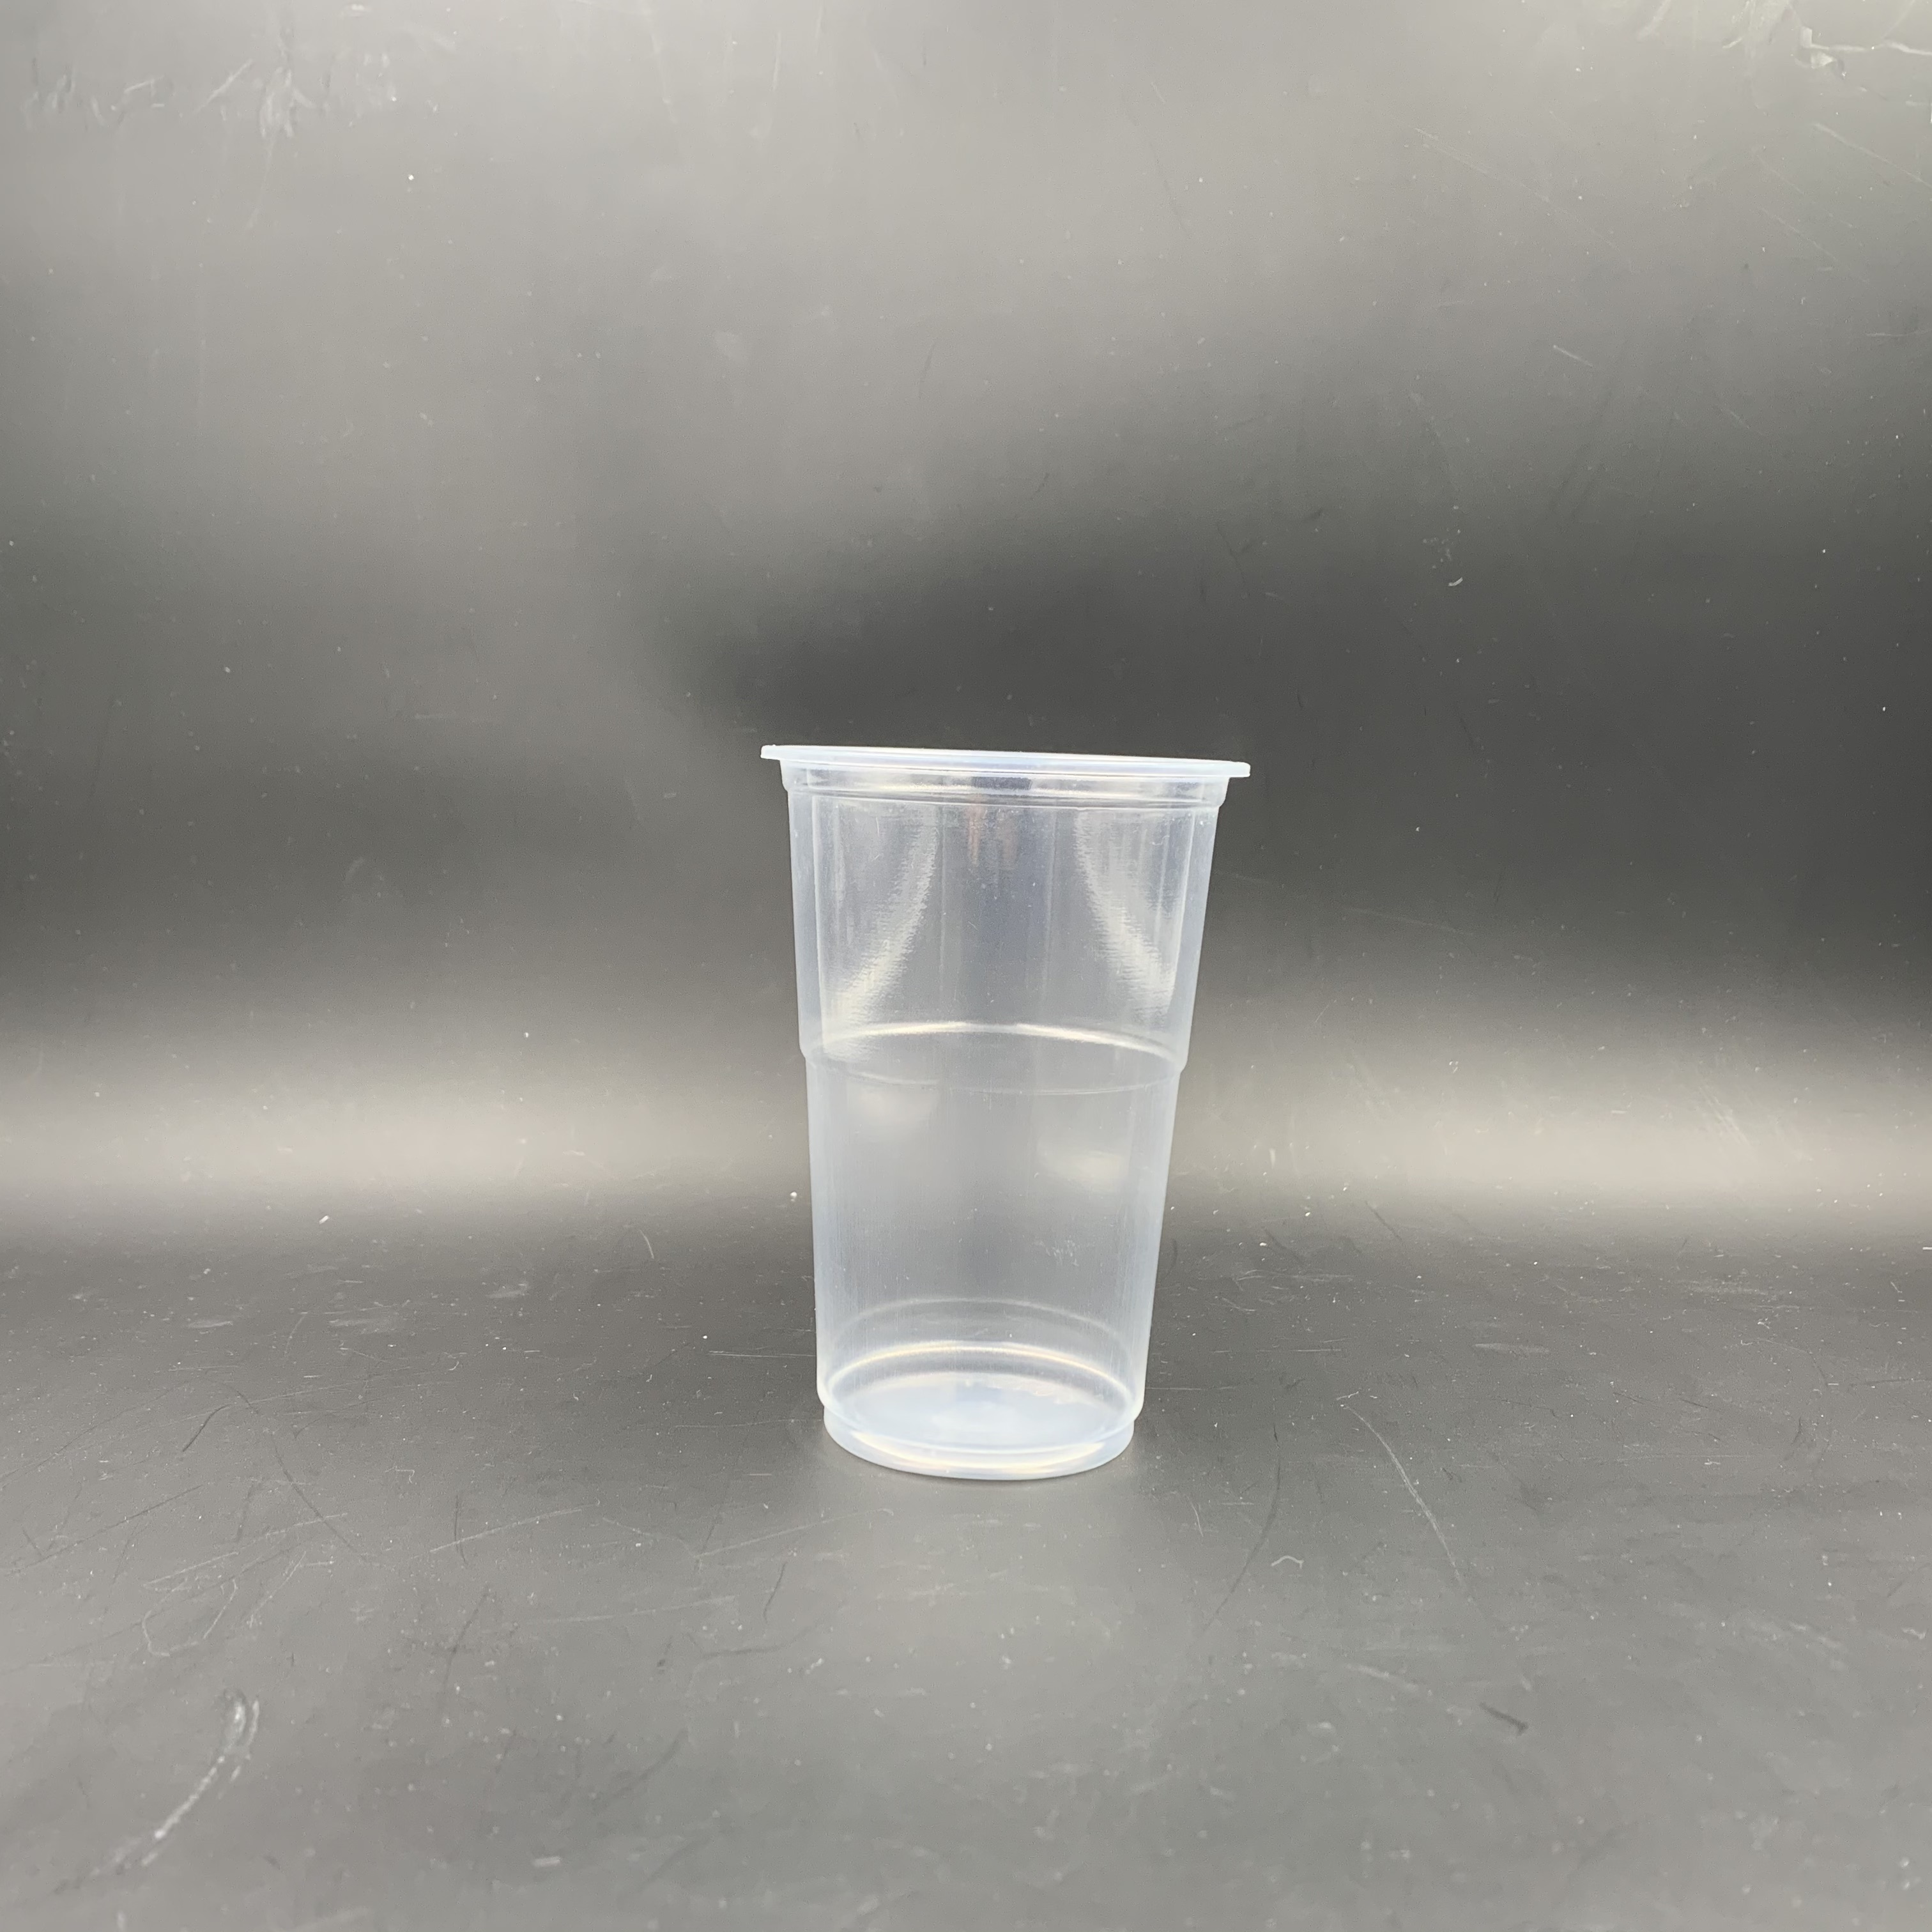 12安士透明PP膠杯